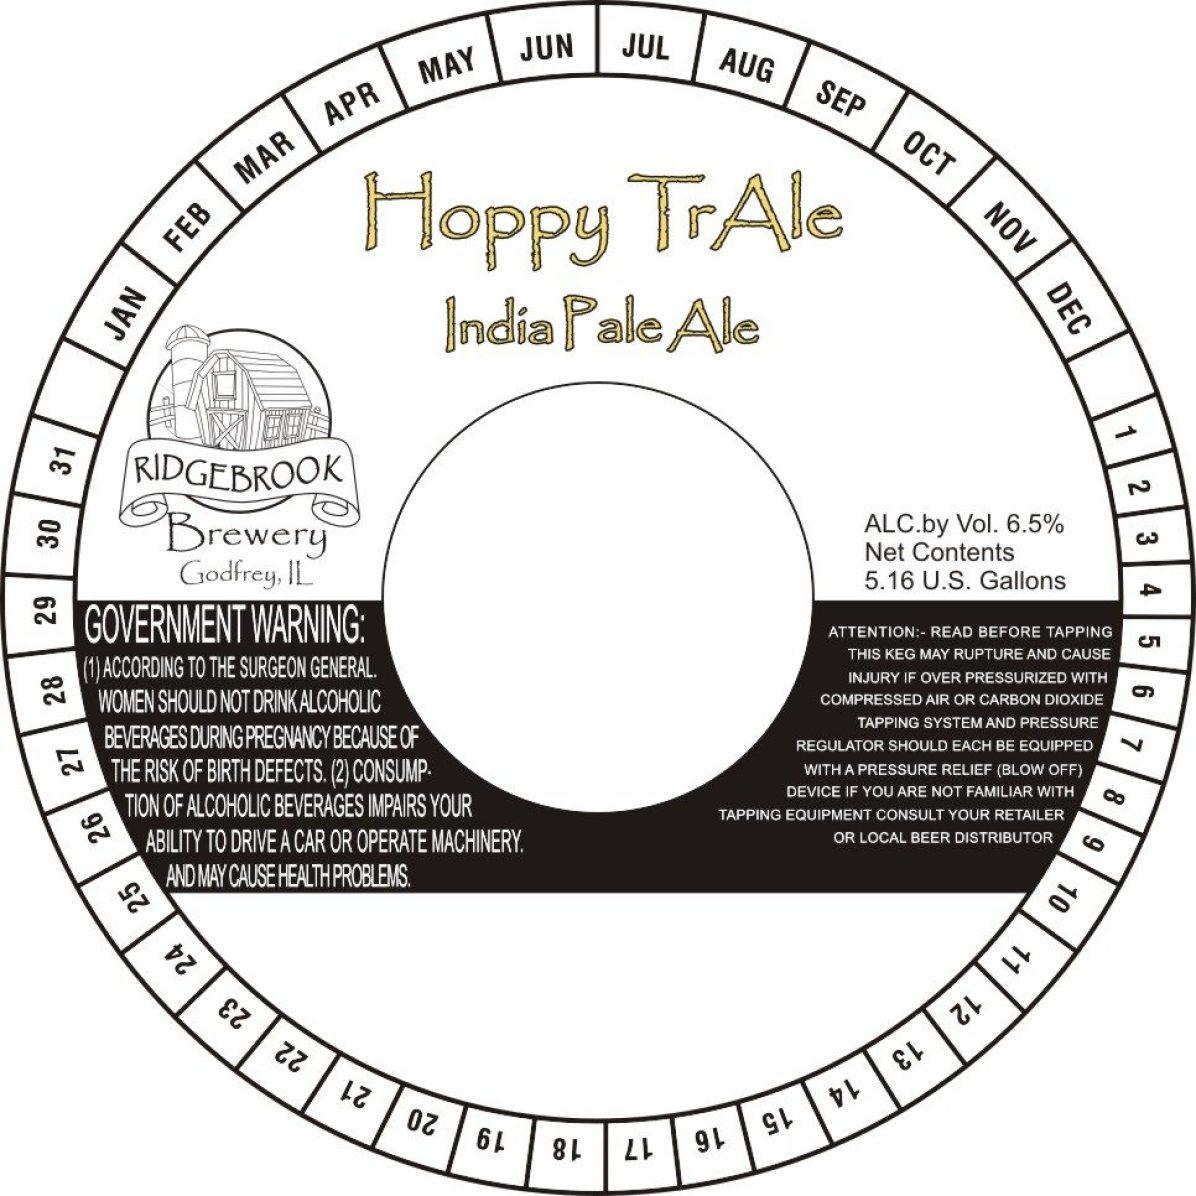 Ridgebrook Brewery Hoppy TrAle